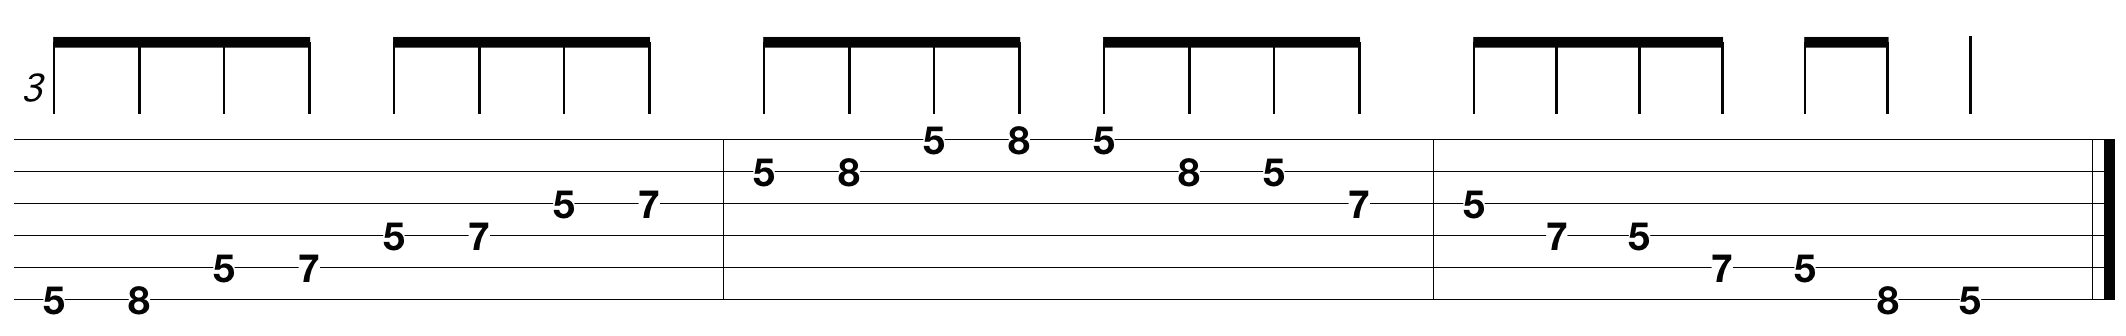 super-easy-guitar-tabs_3.png